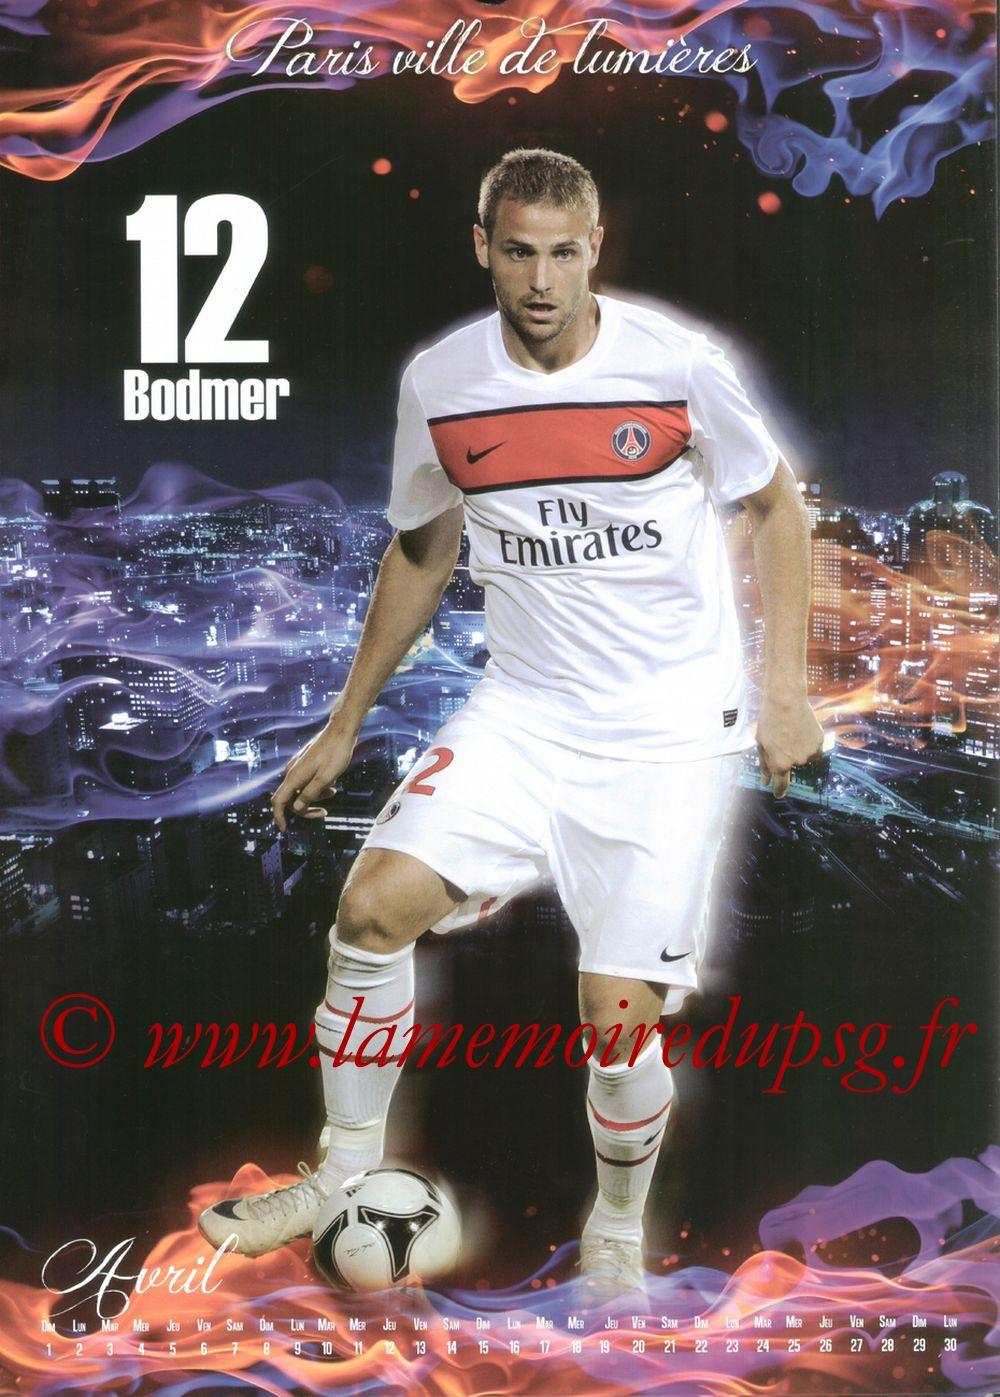 Calendrier PSG 2012bis - Page 04 - Mathieu BODMER